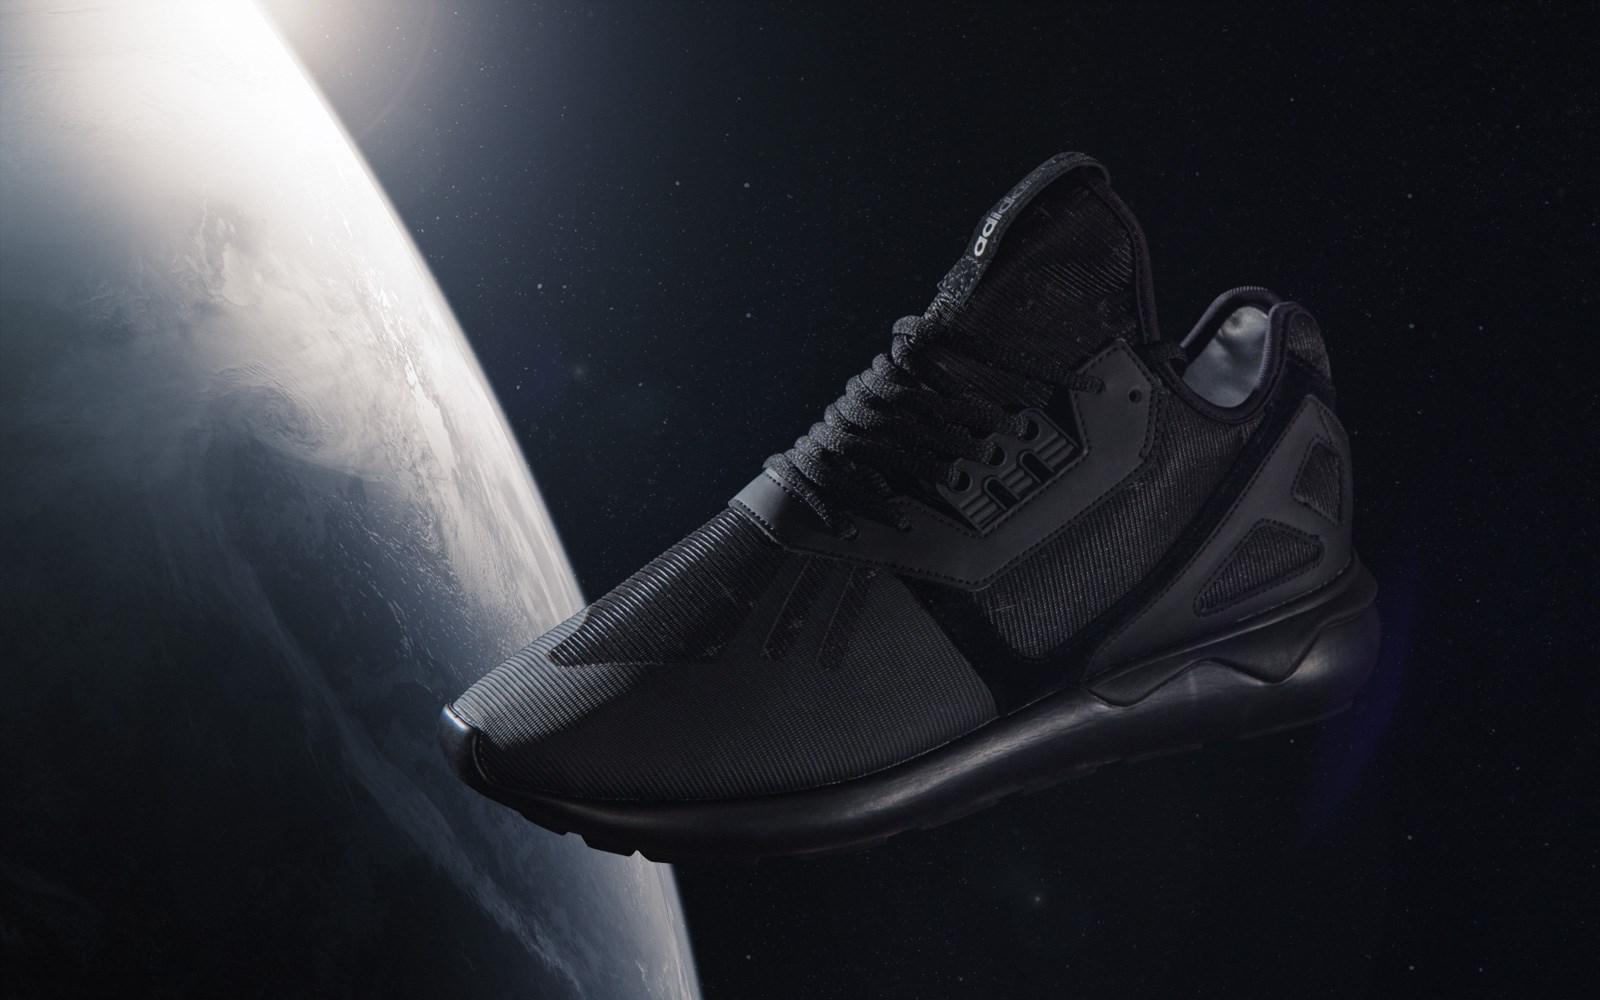 adidas Tubular Runner 'Starry'